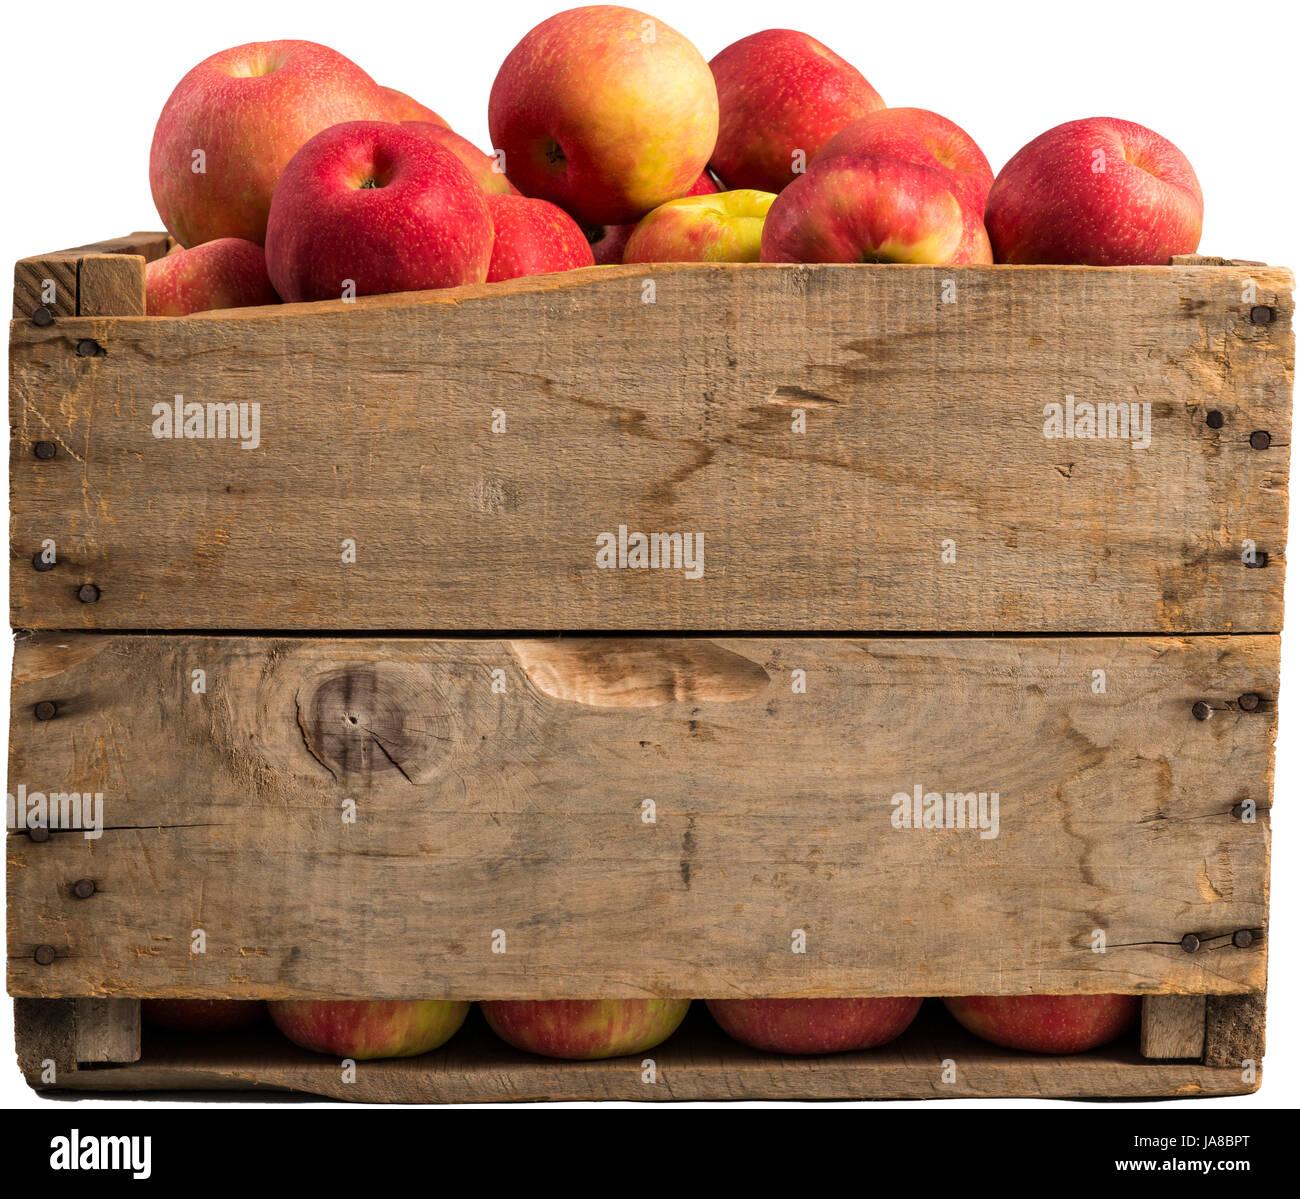 Box Wood Nails Stockfotos & Box Wood Nails Bilder - Alamy